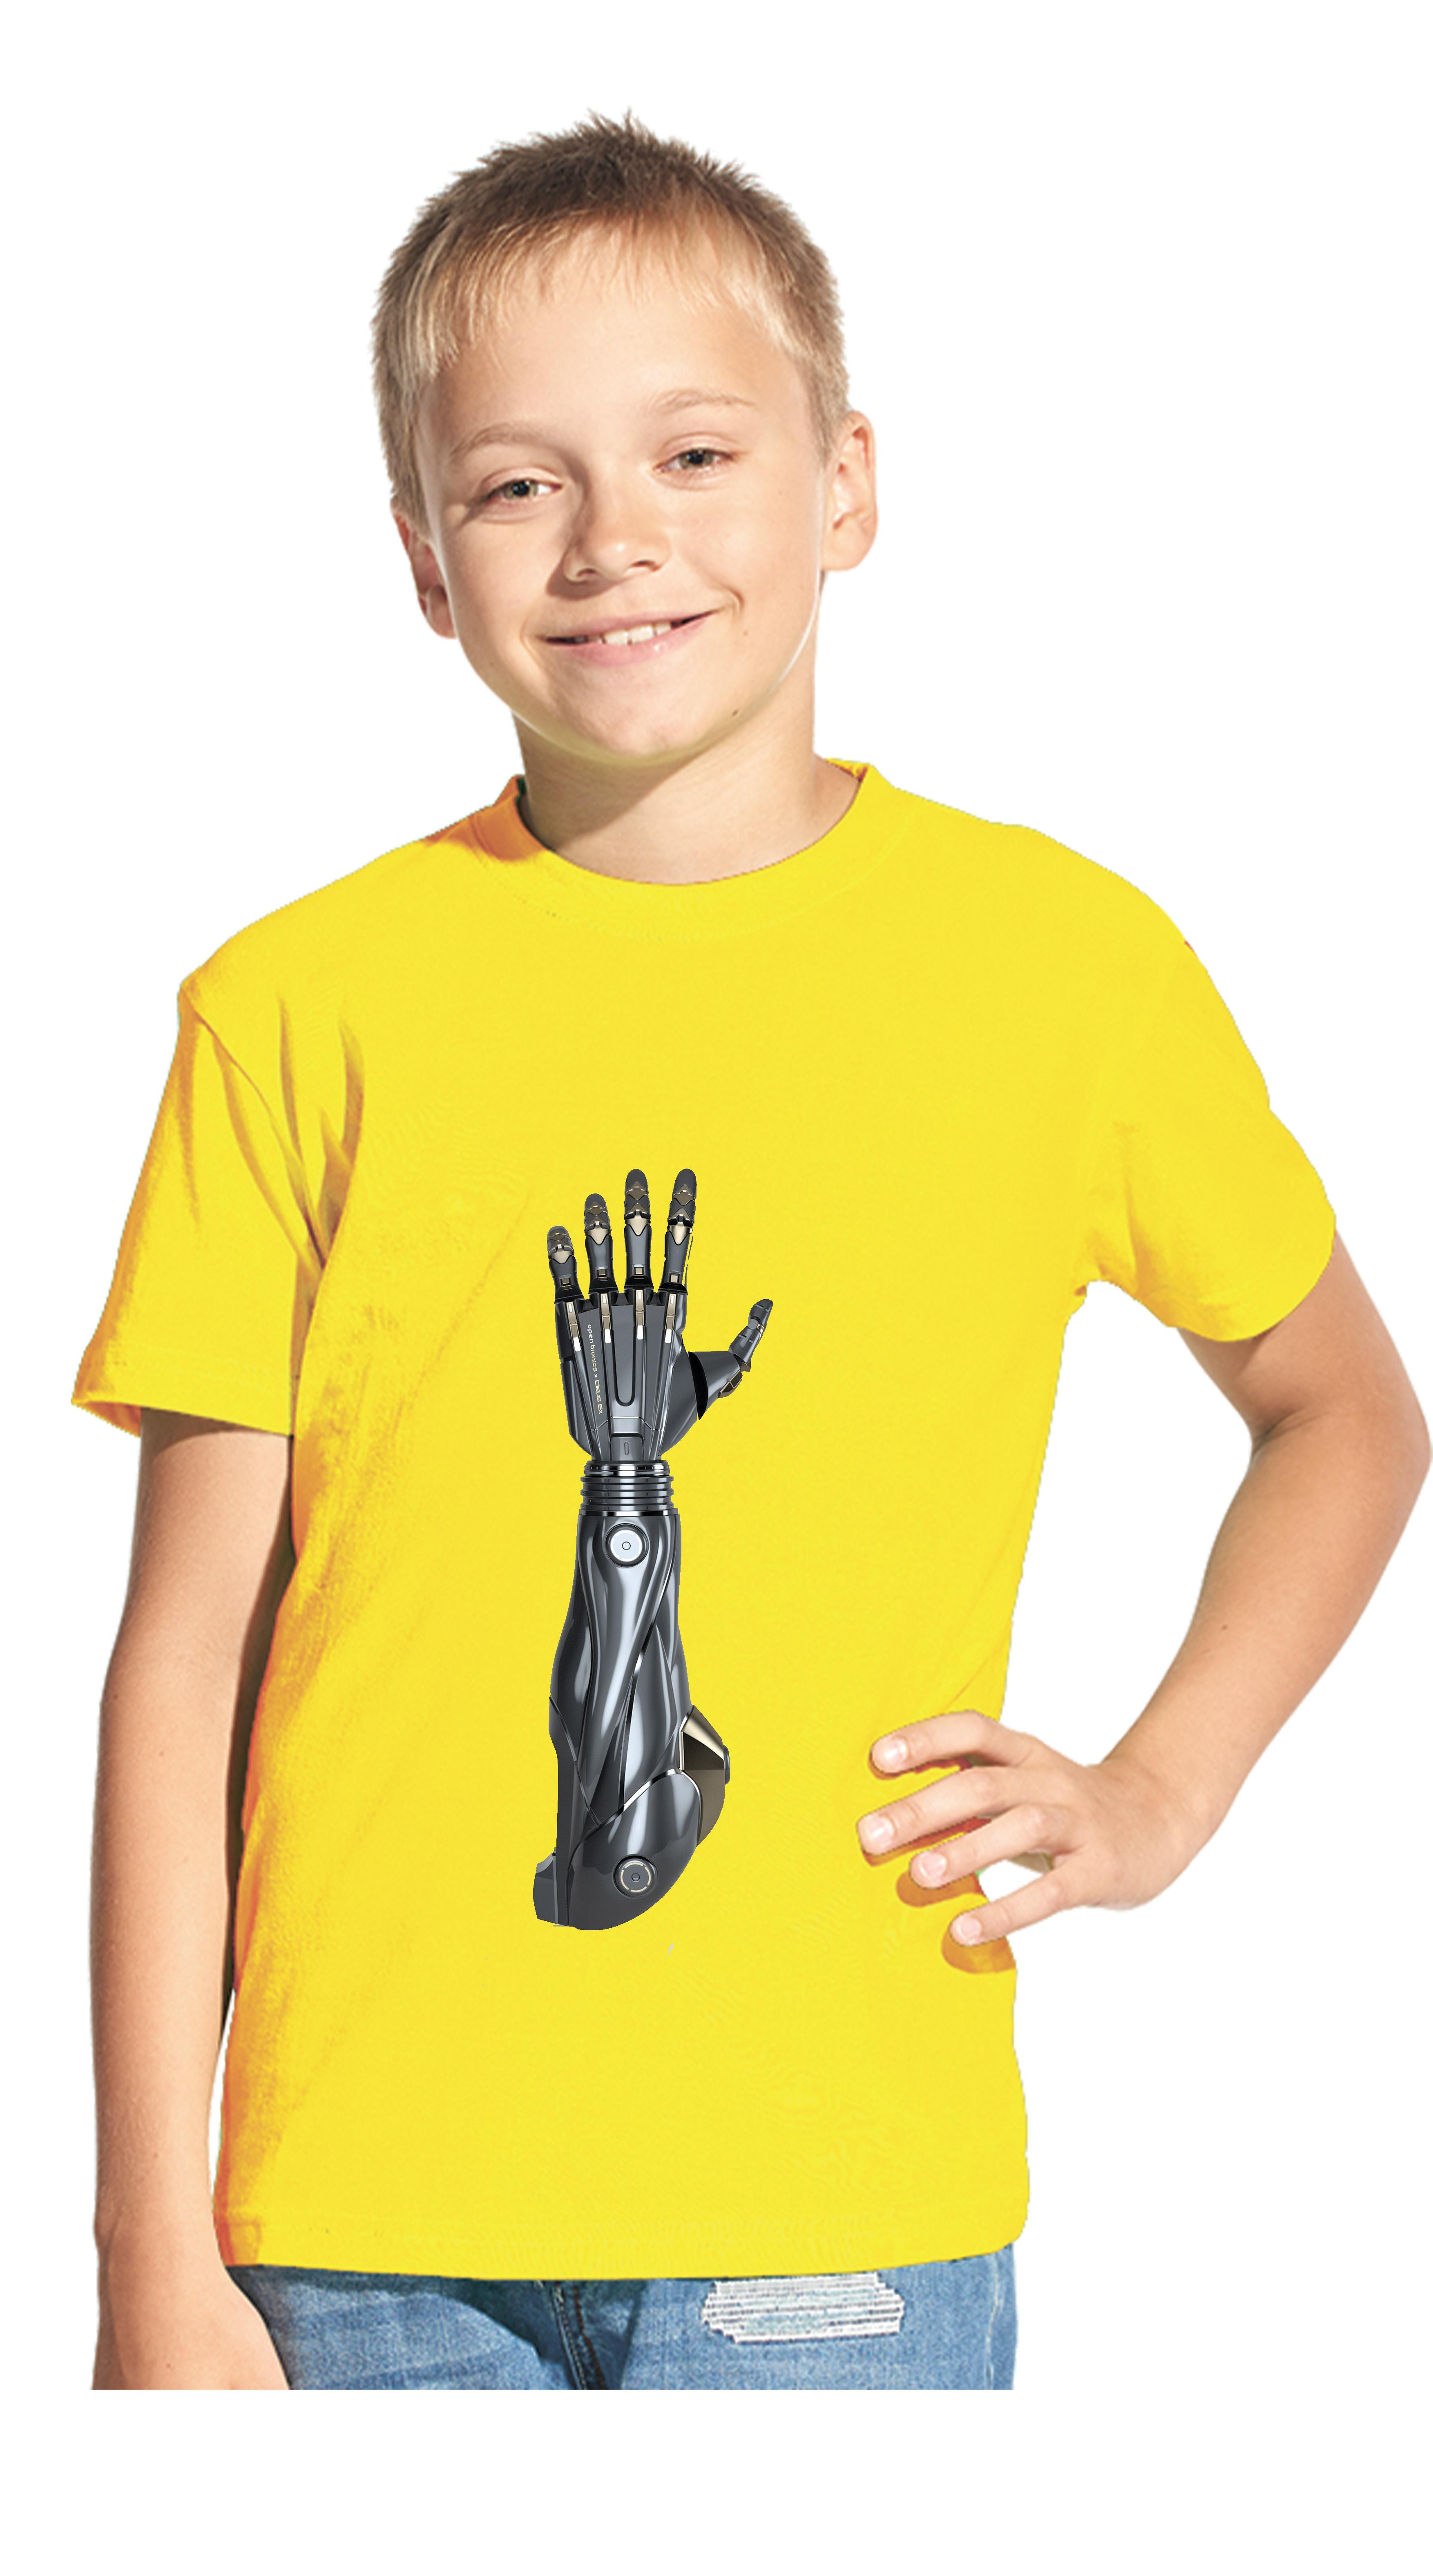 Нарисовать принты на футболки для компании Моторика фото f_81460a5f2555b6c9.jpg